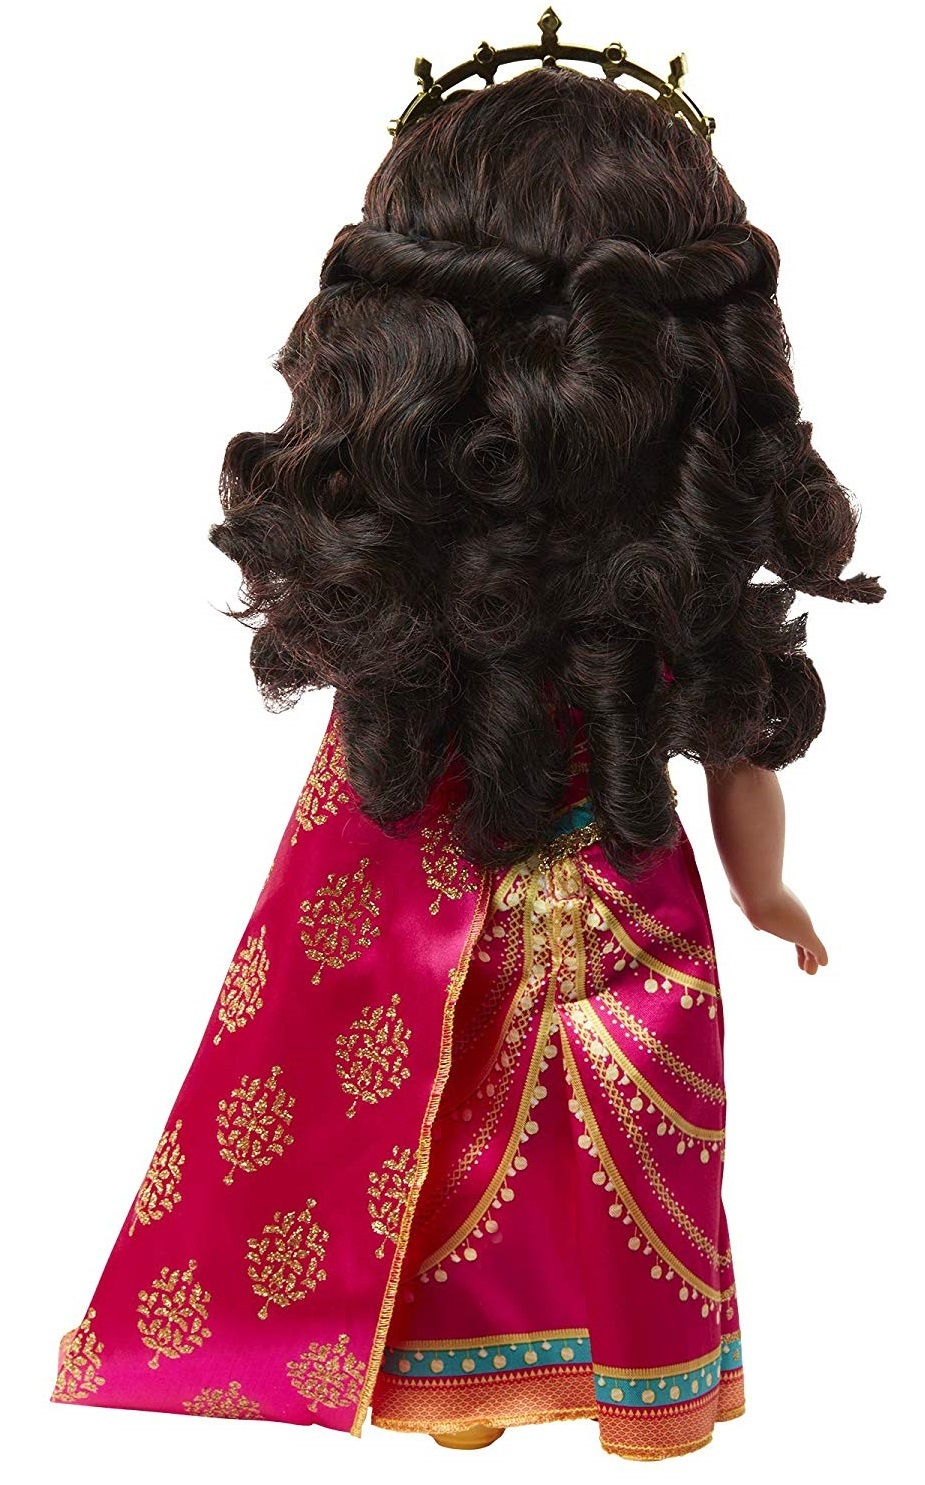 Princess Jasmine - Musical Singing Doll image